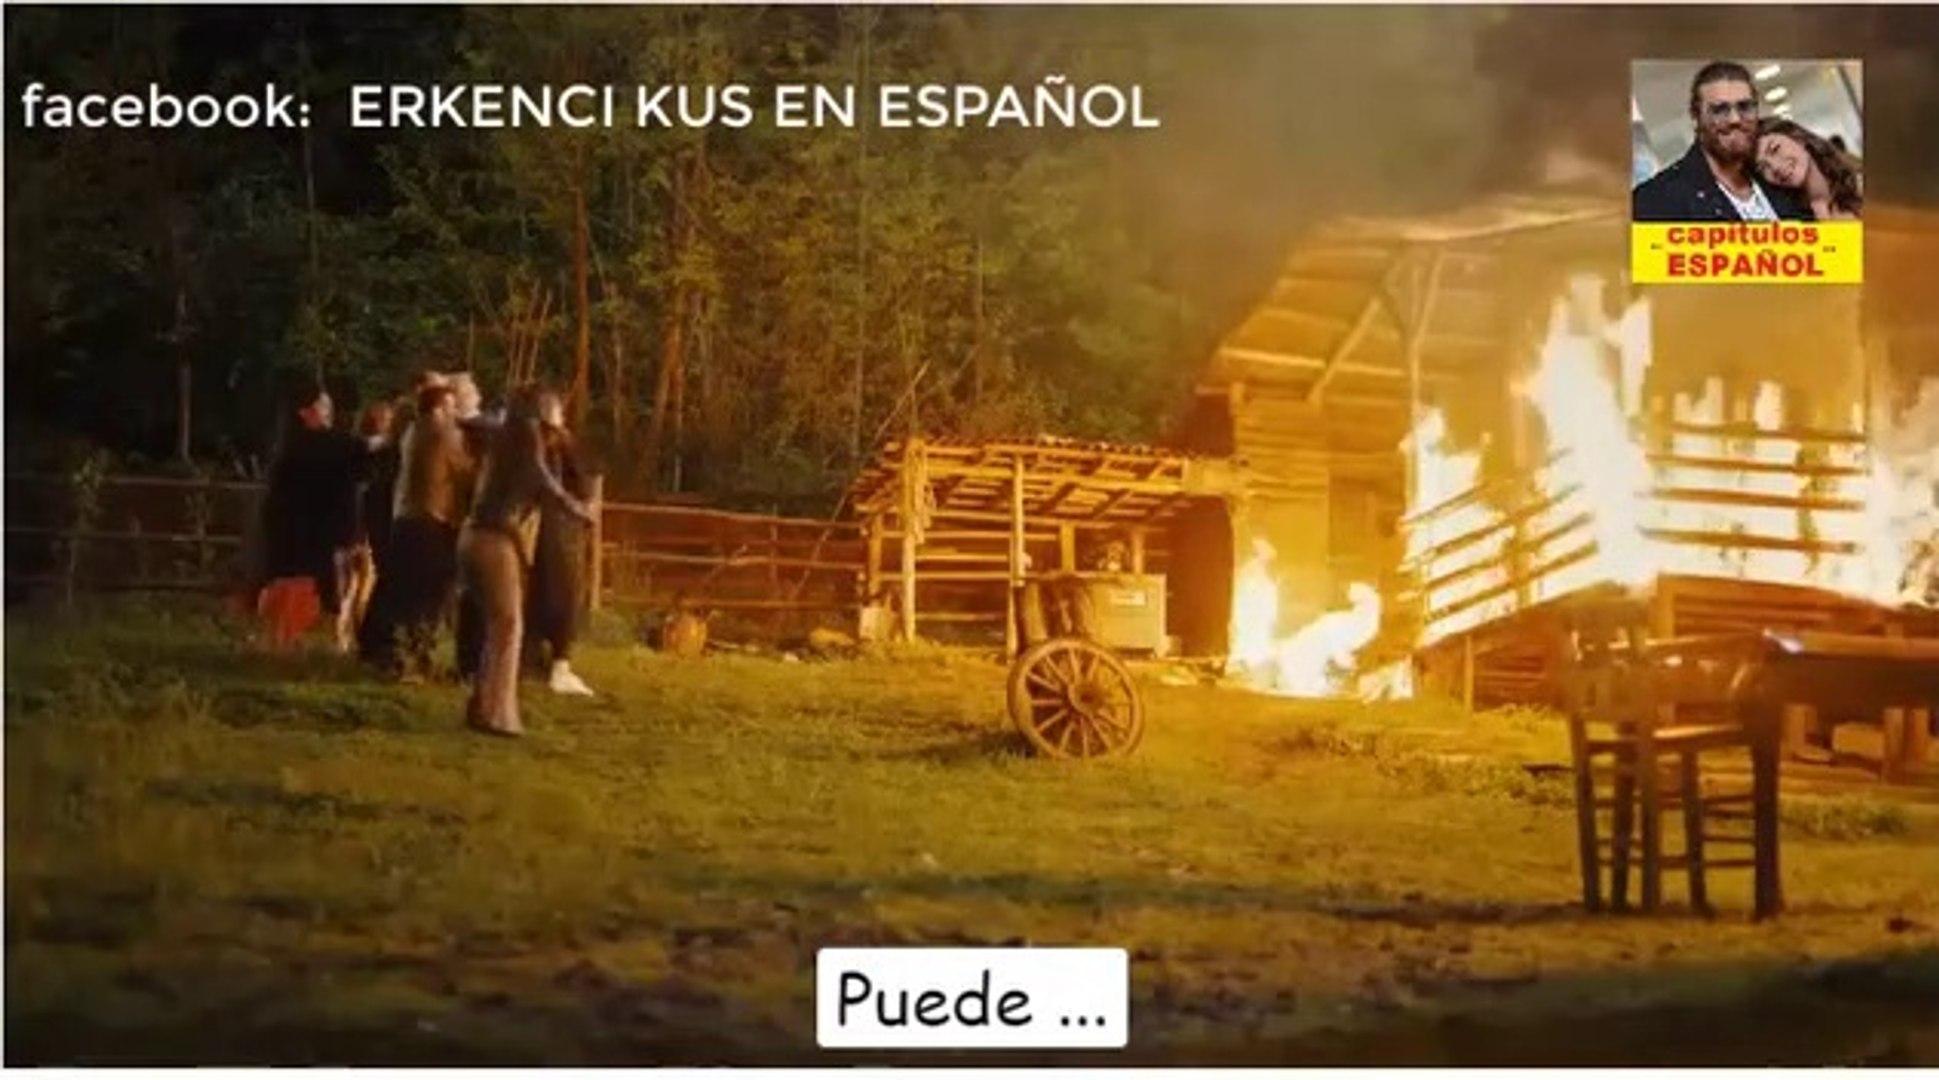 ERKENCI KUS CAPITULO 41 en español (Parte 3 final )